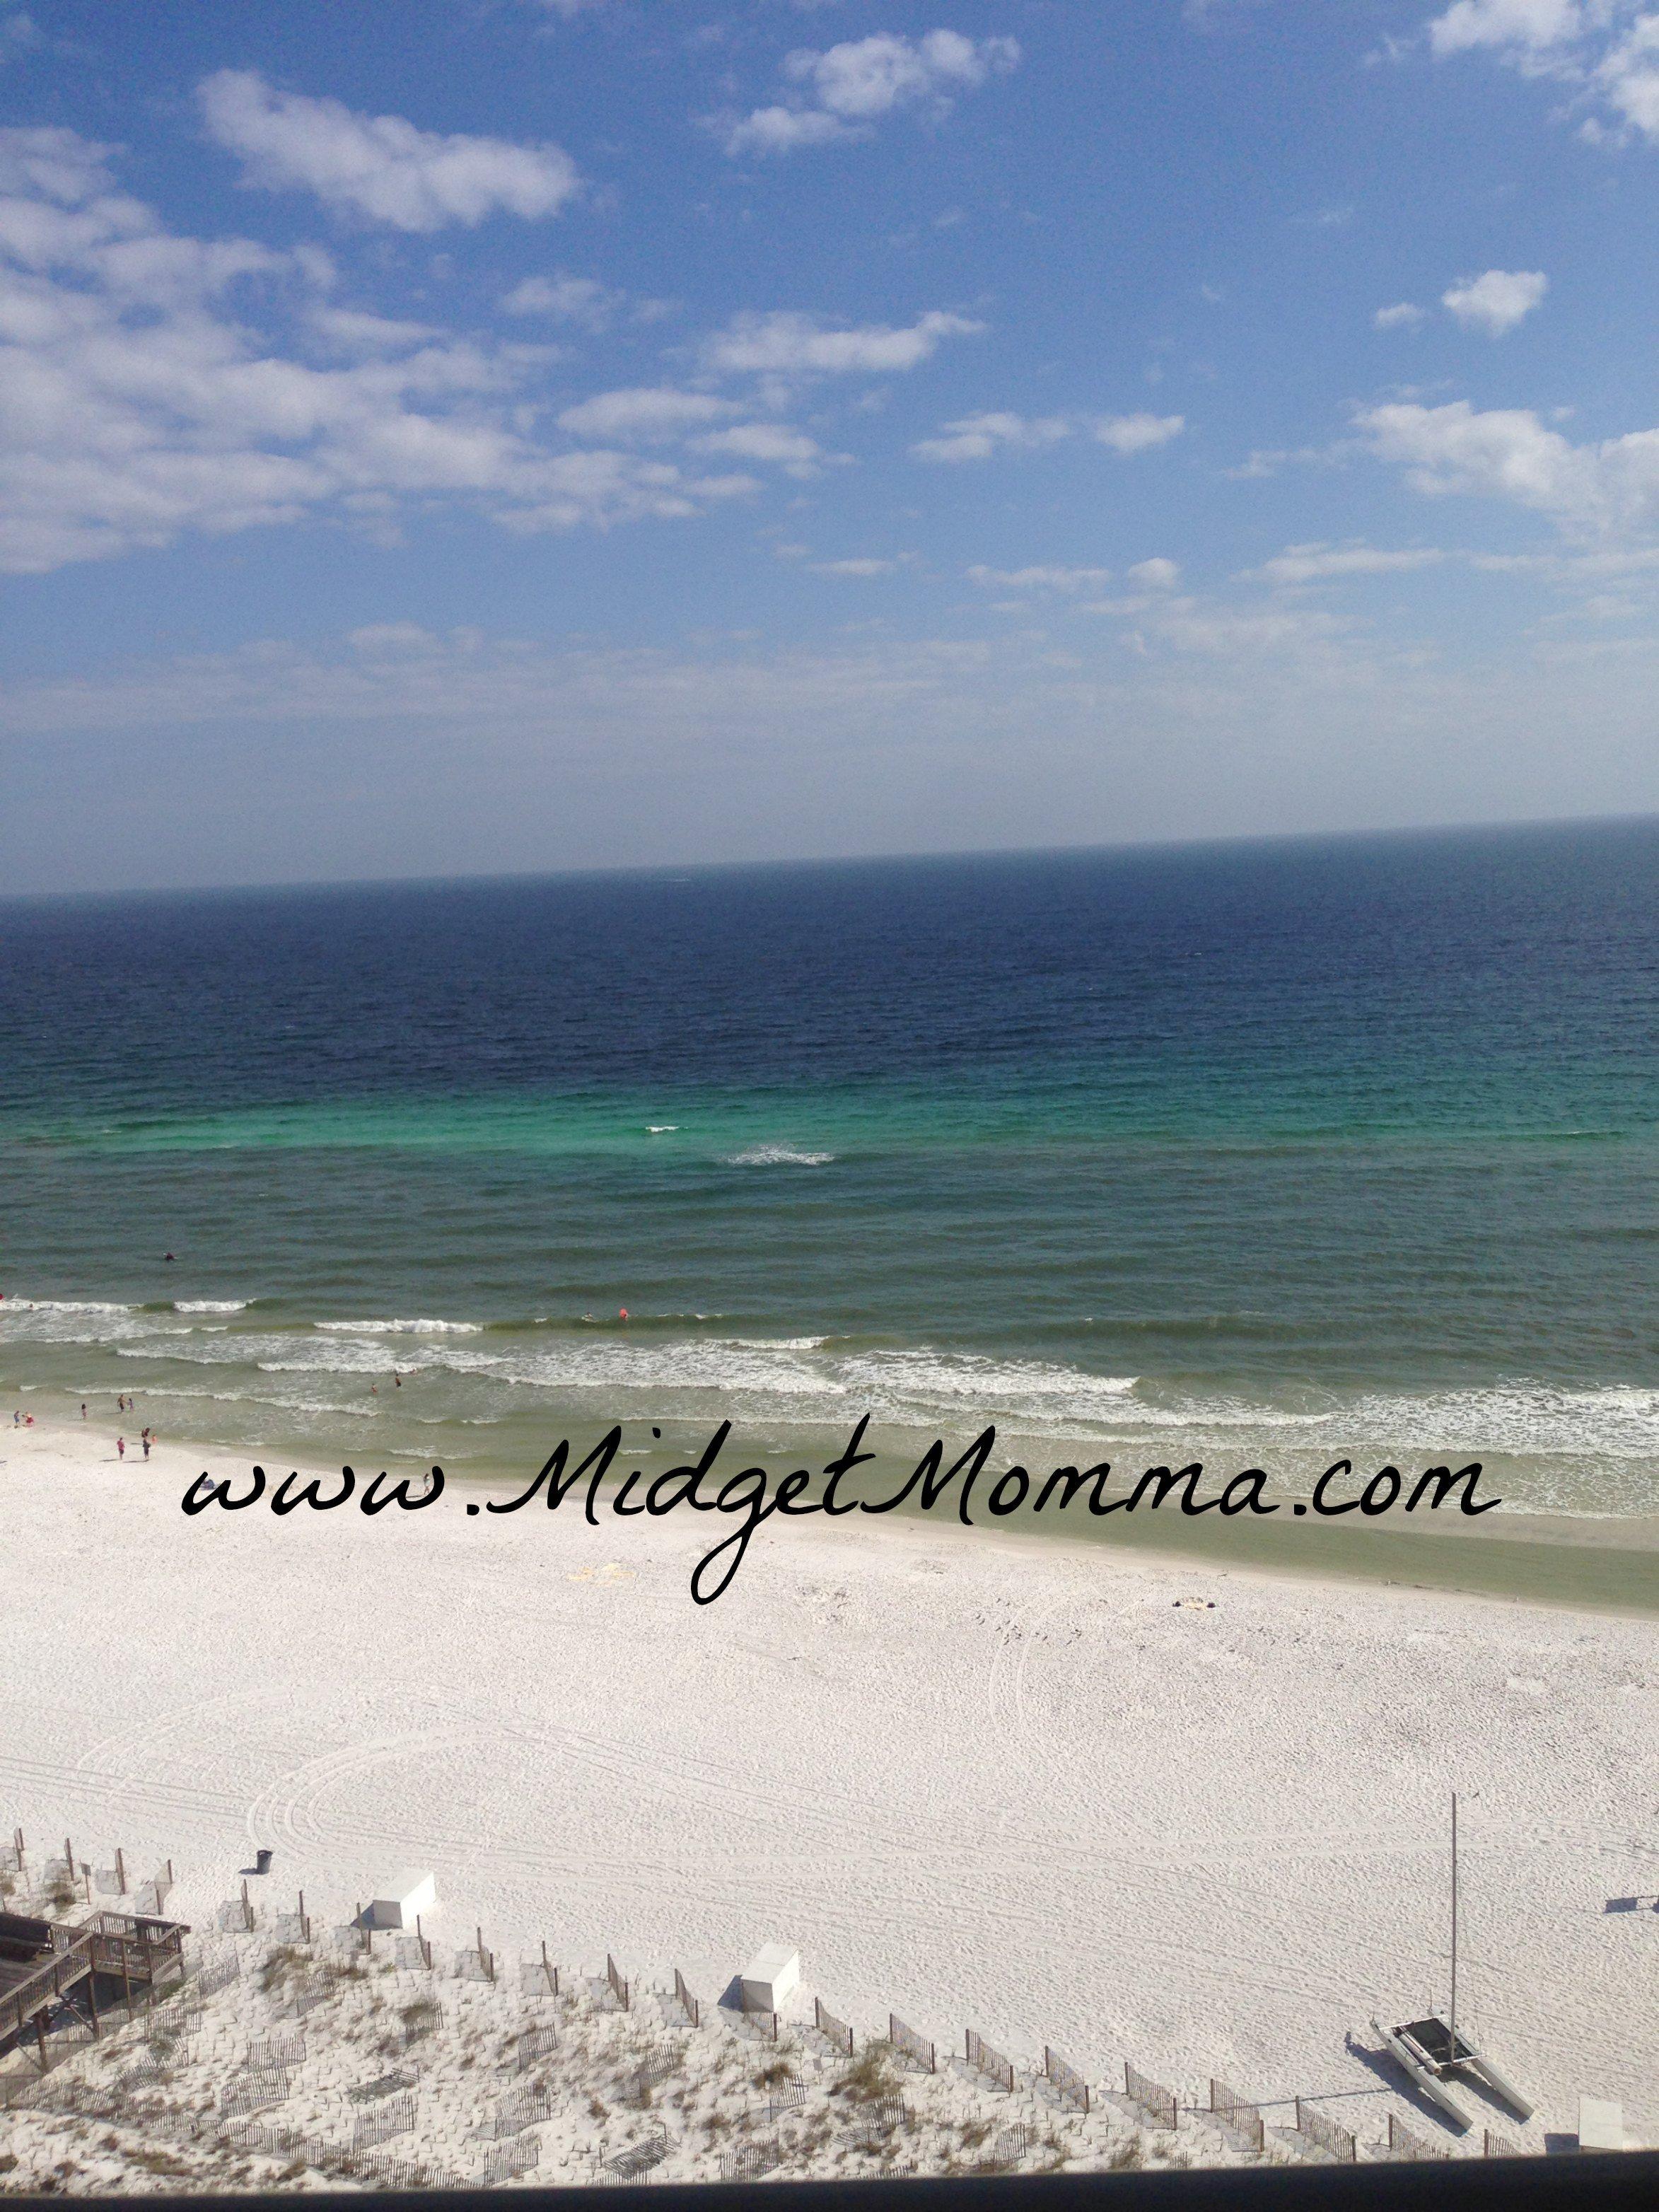 Sandestin Resort Sand Trap Destin Miramar Beach  Feedback